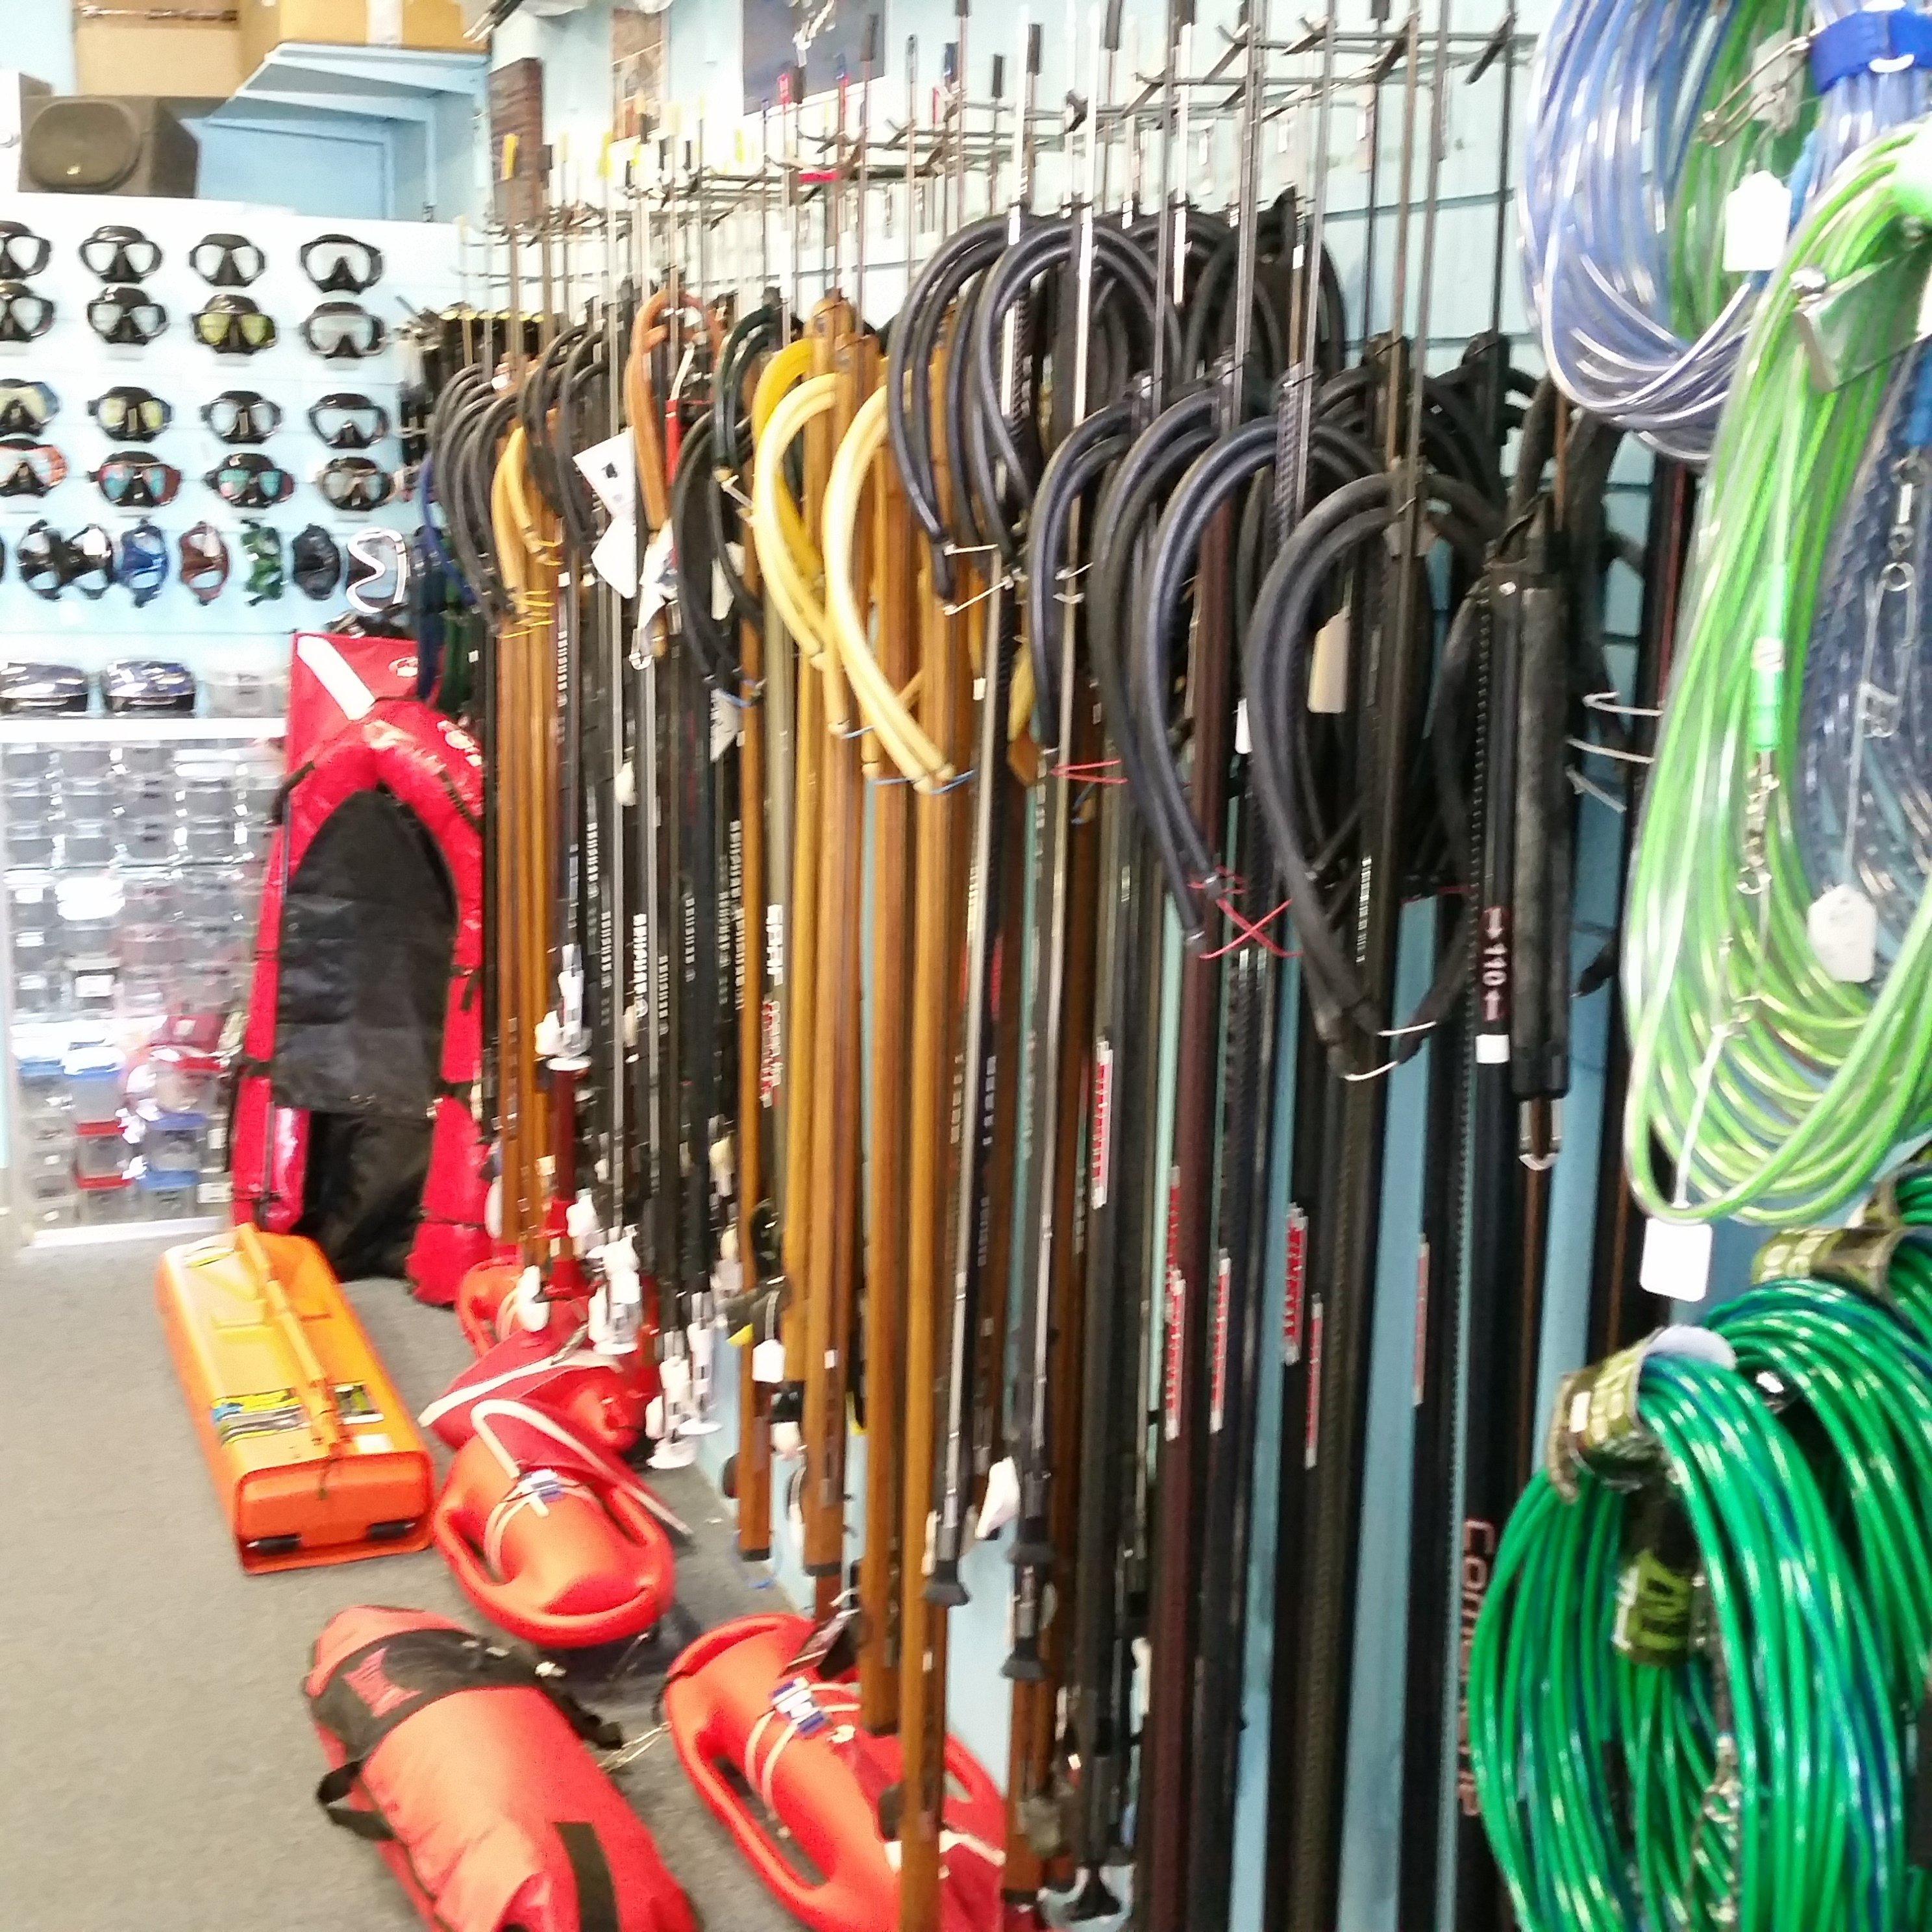 Fishing tackle honolulu maui sporting goods spearfishing for Maui fishing supply